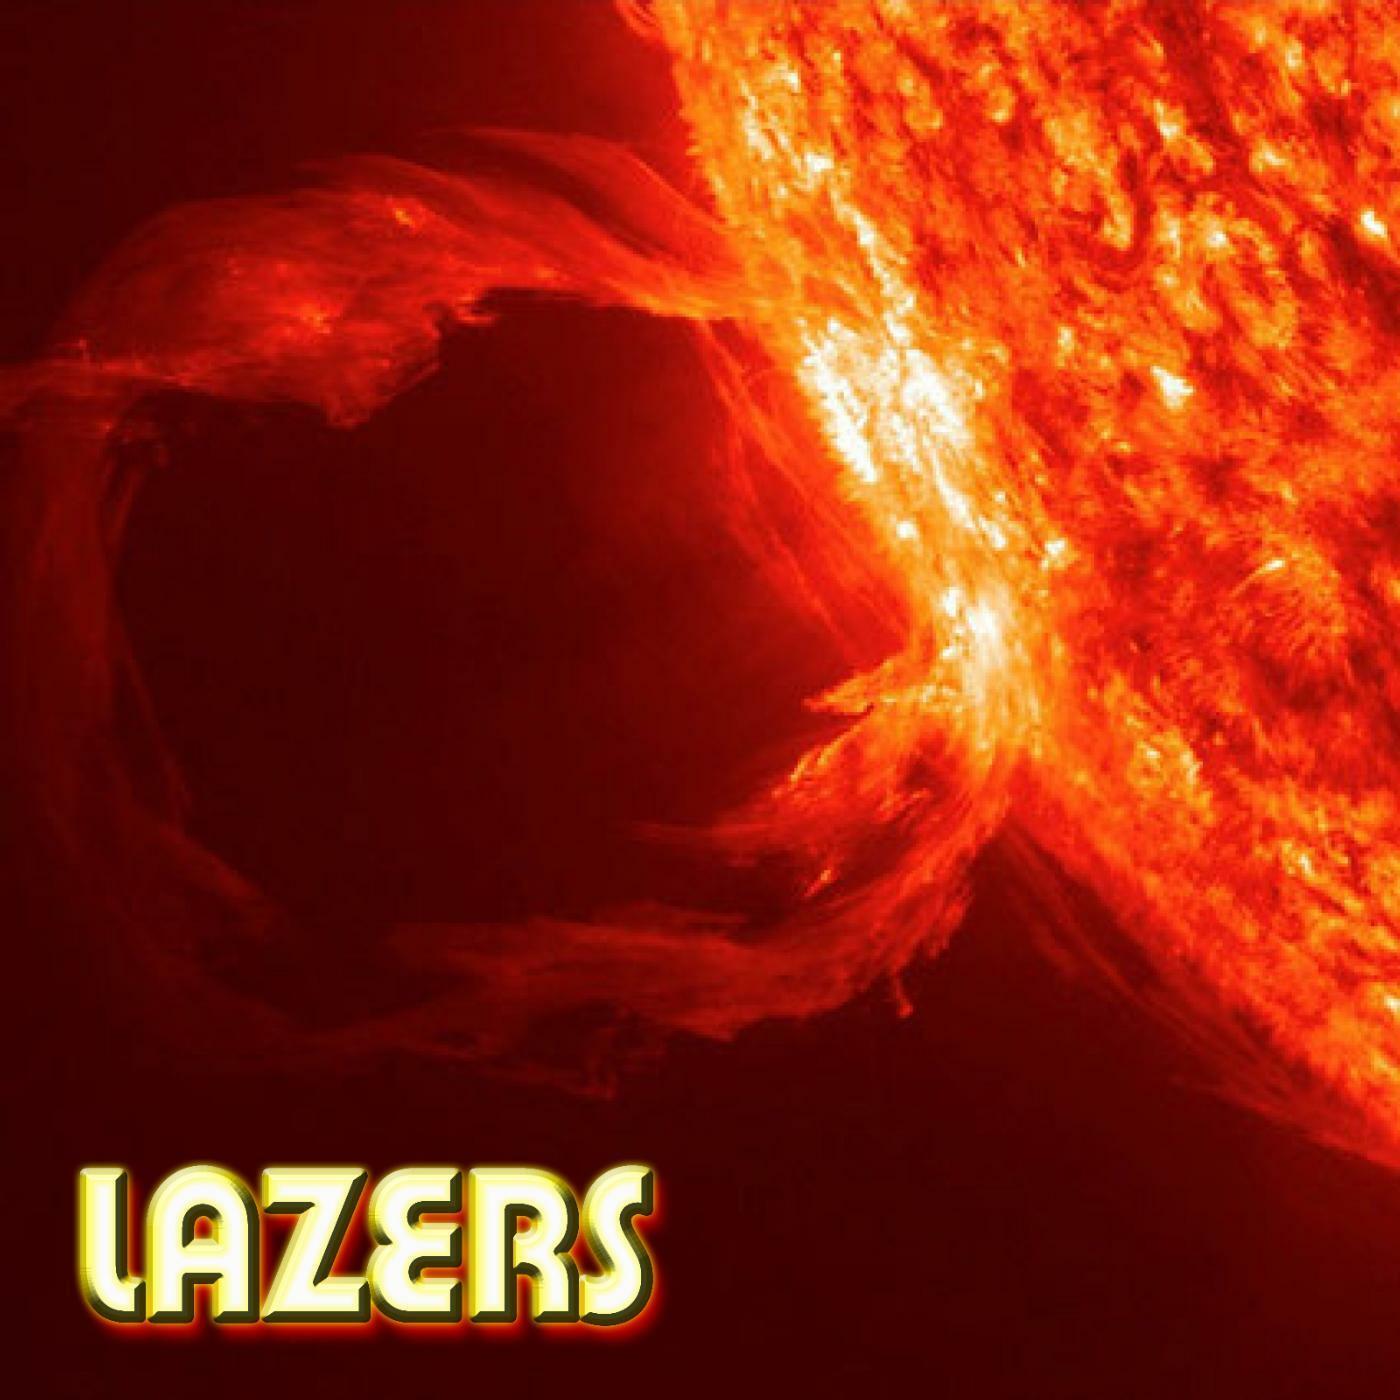 recent solar flare - 1016×1017